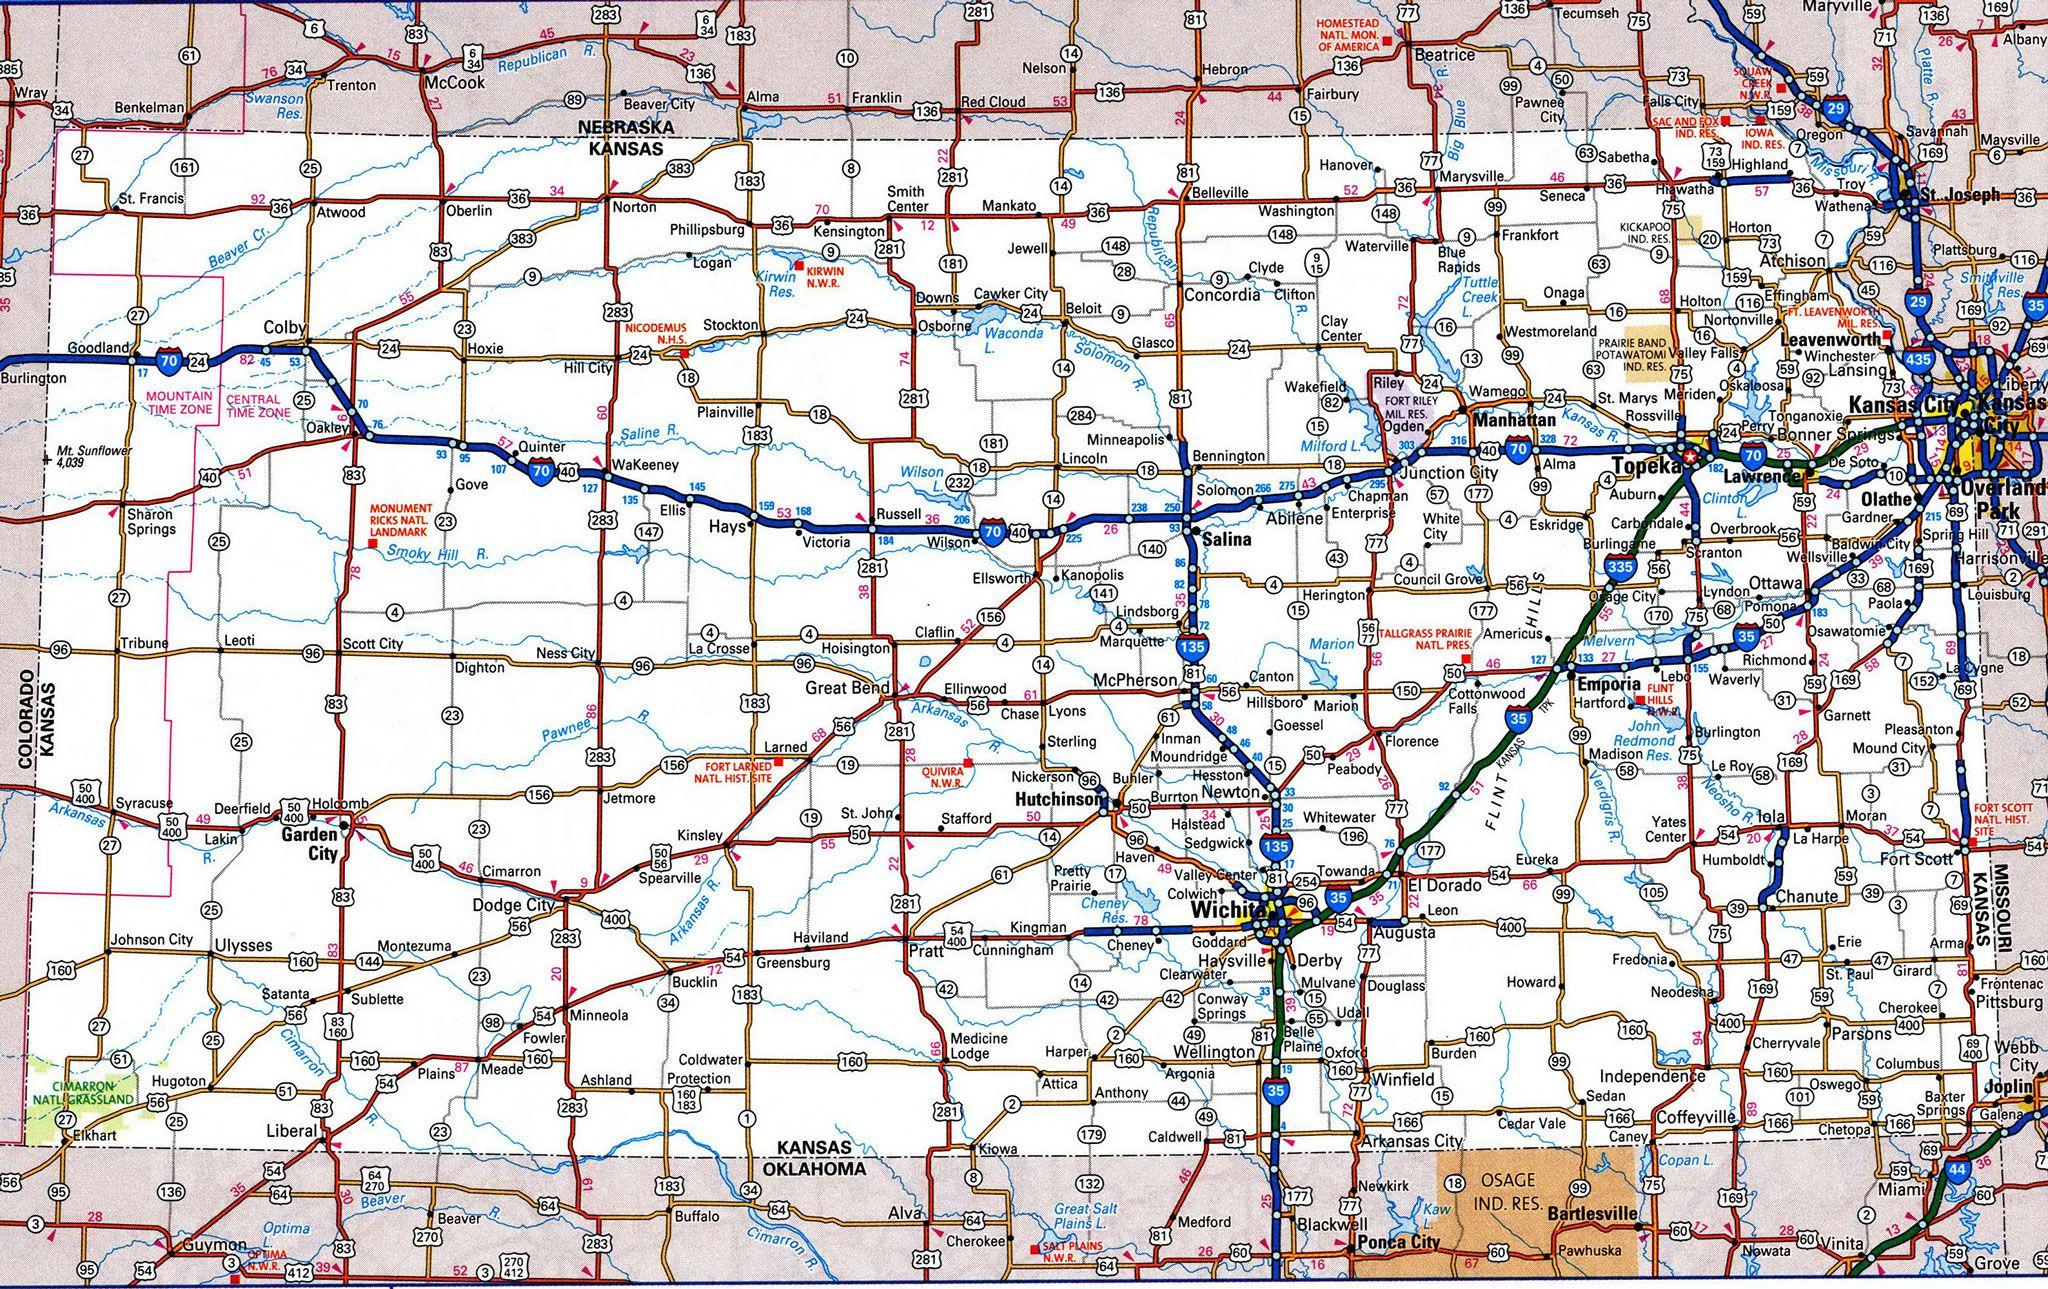 Road Map Of KansasFree Maps Of US TravelUSKanIwaNebMo - Us map with roads